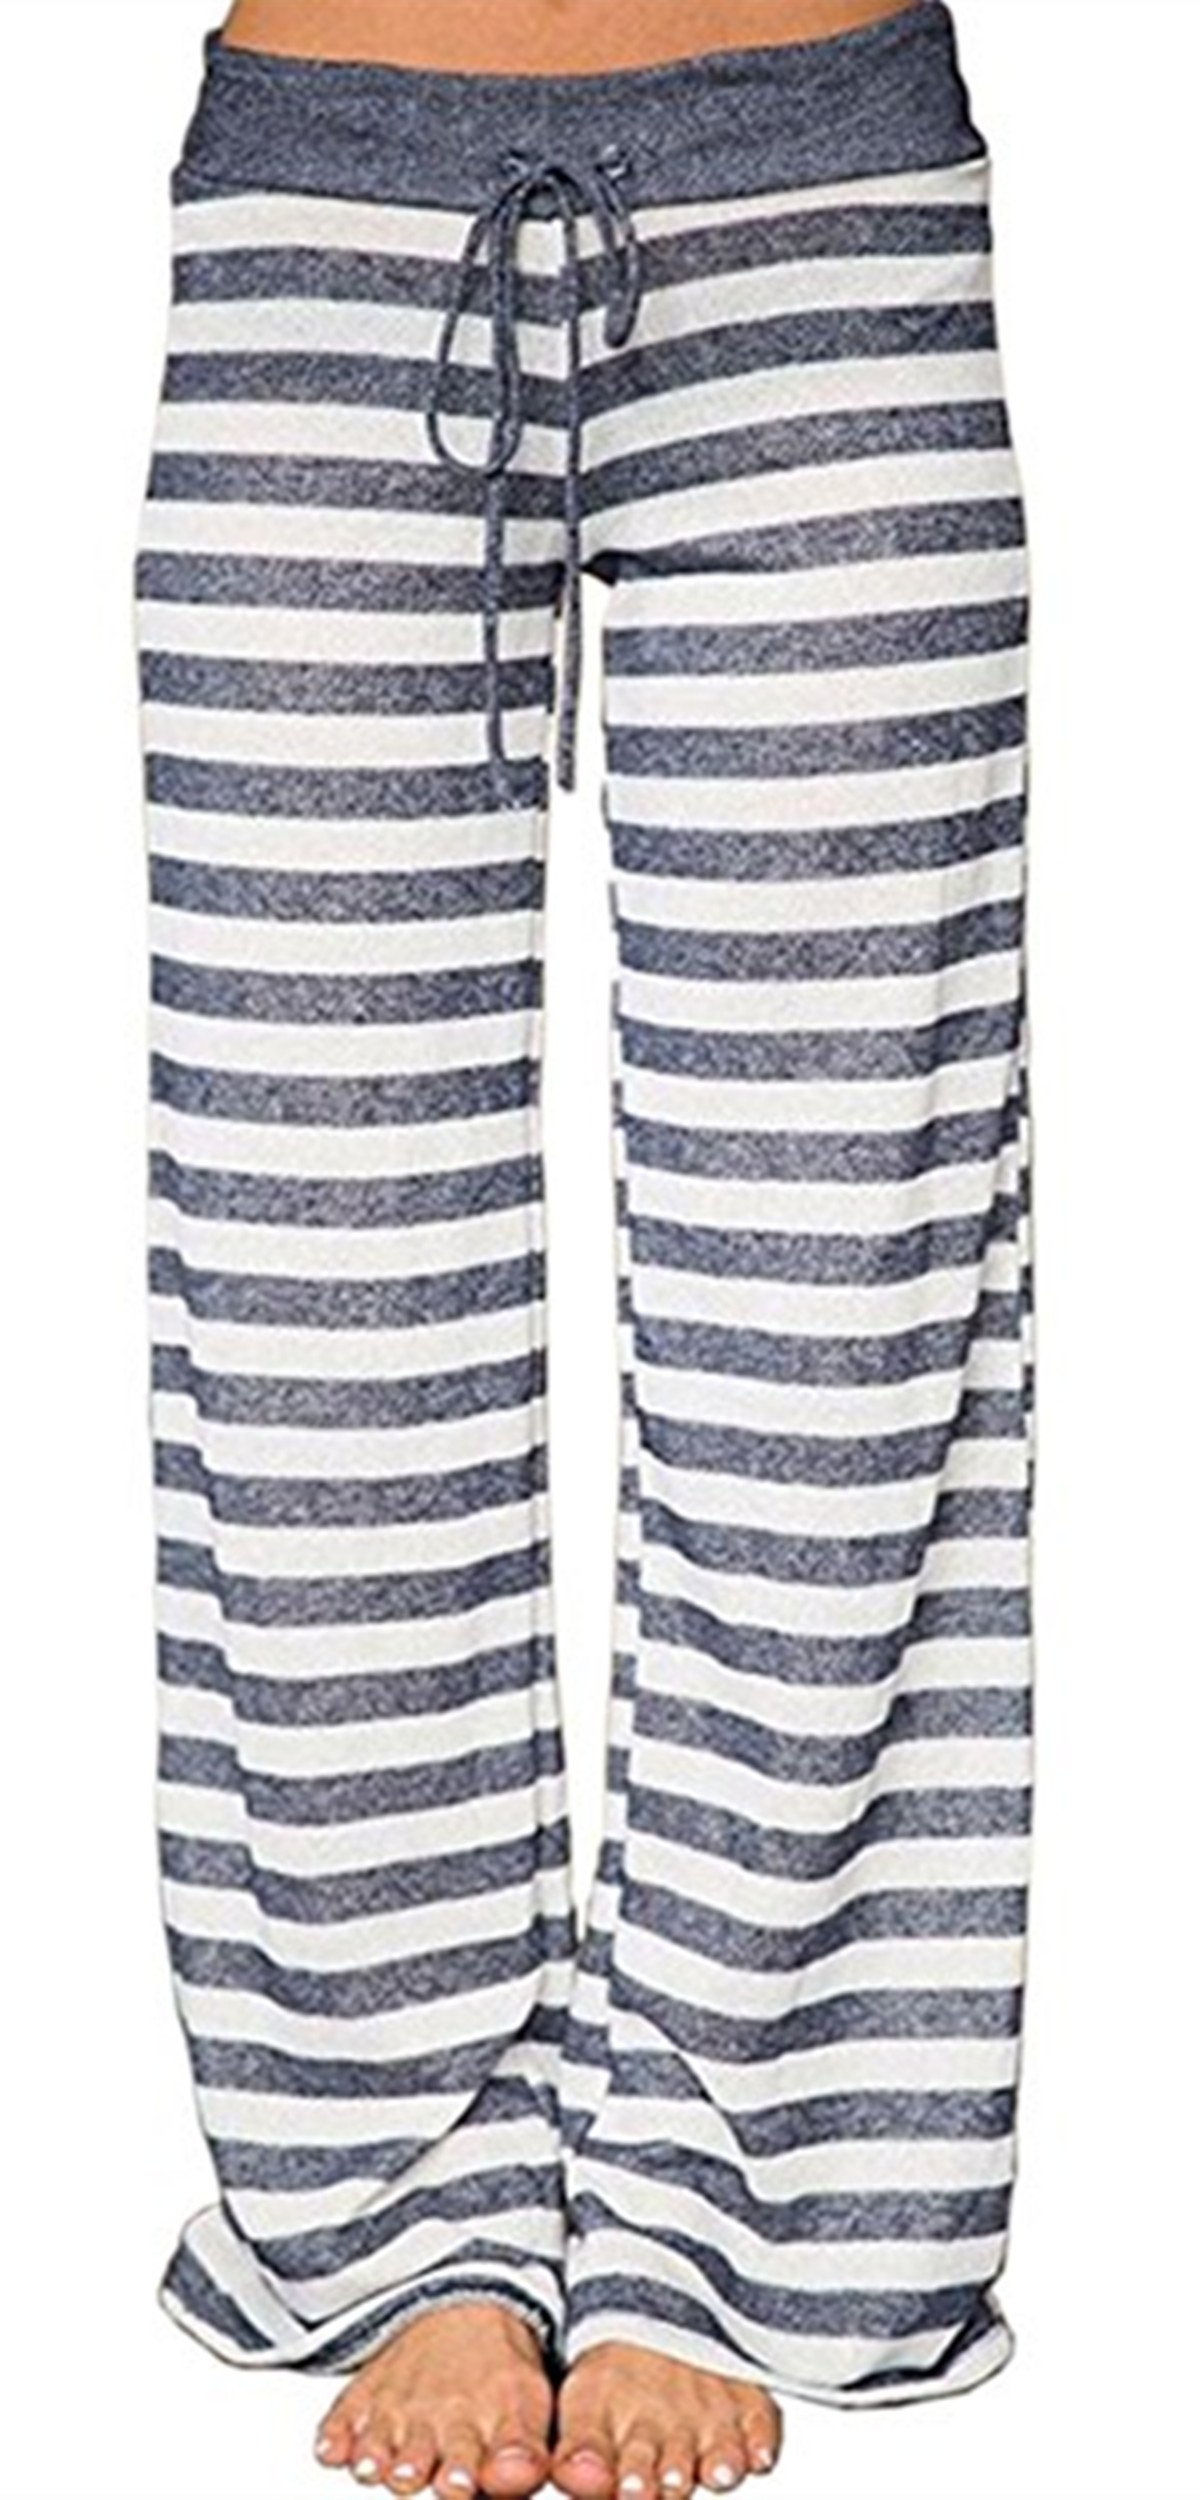 Sexymee Women's Stretch Cotton Pajama Lounge Pants Polka Dot Striped Sleepwear,Grey Striped,Medium